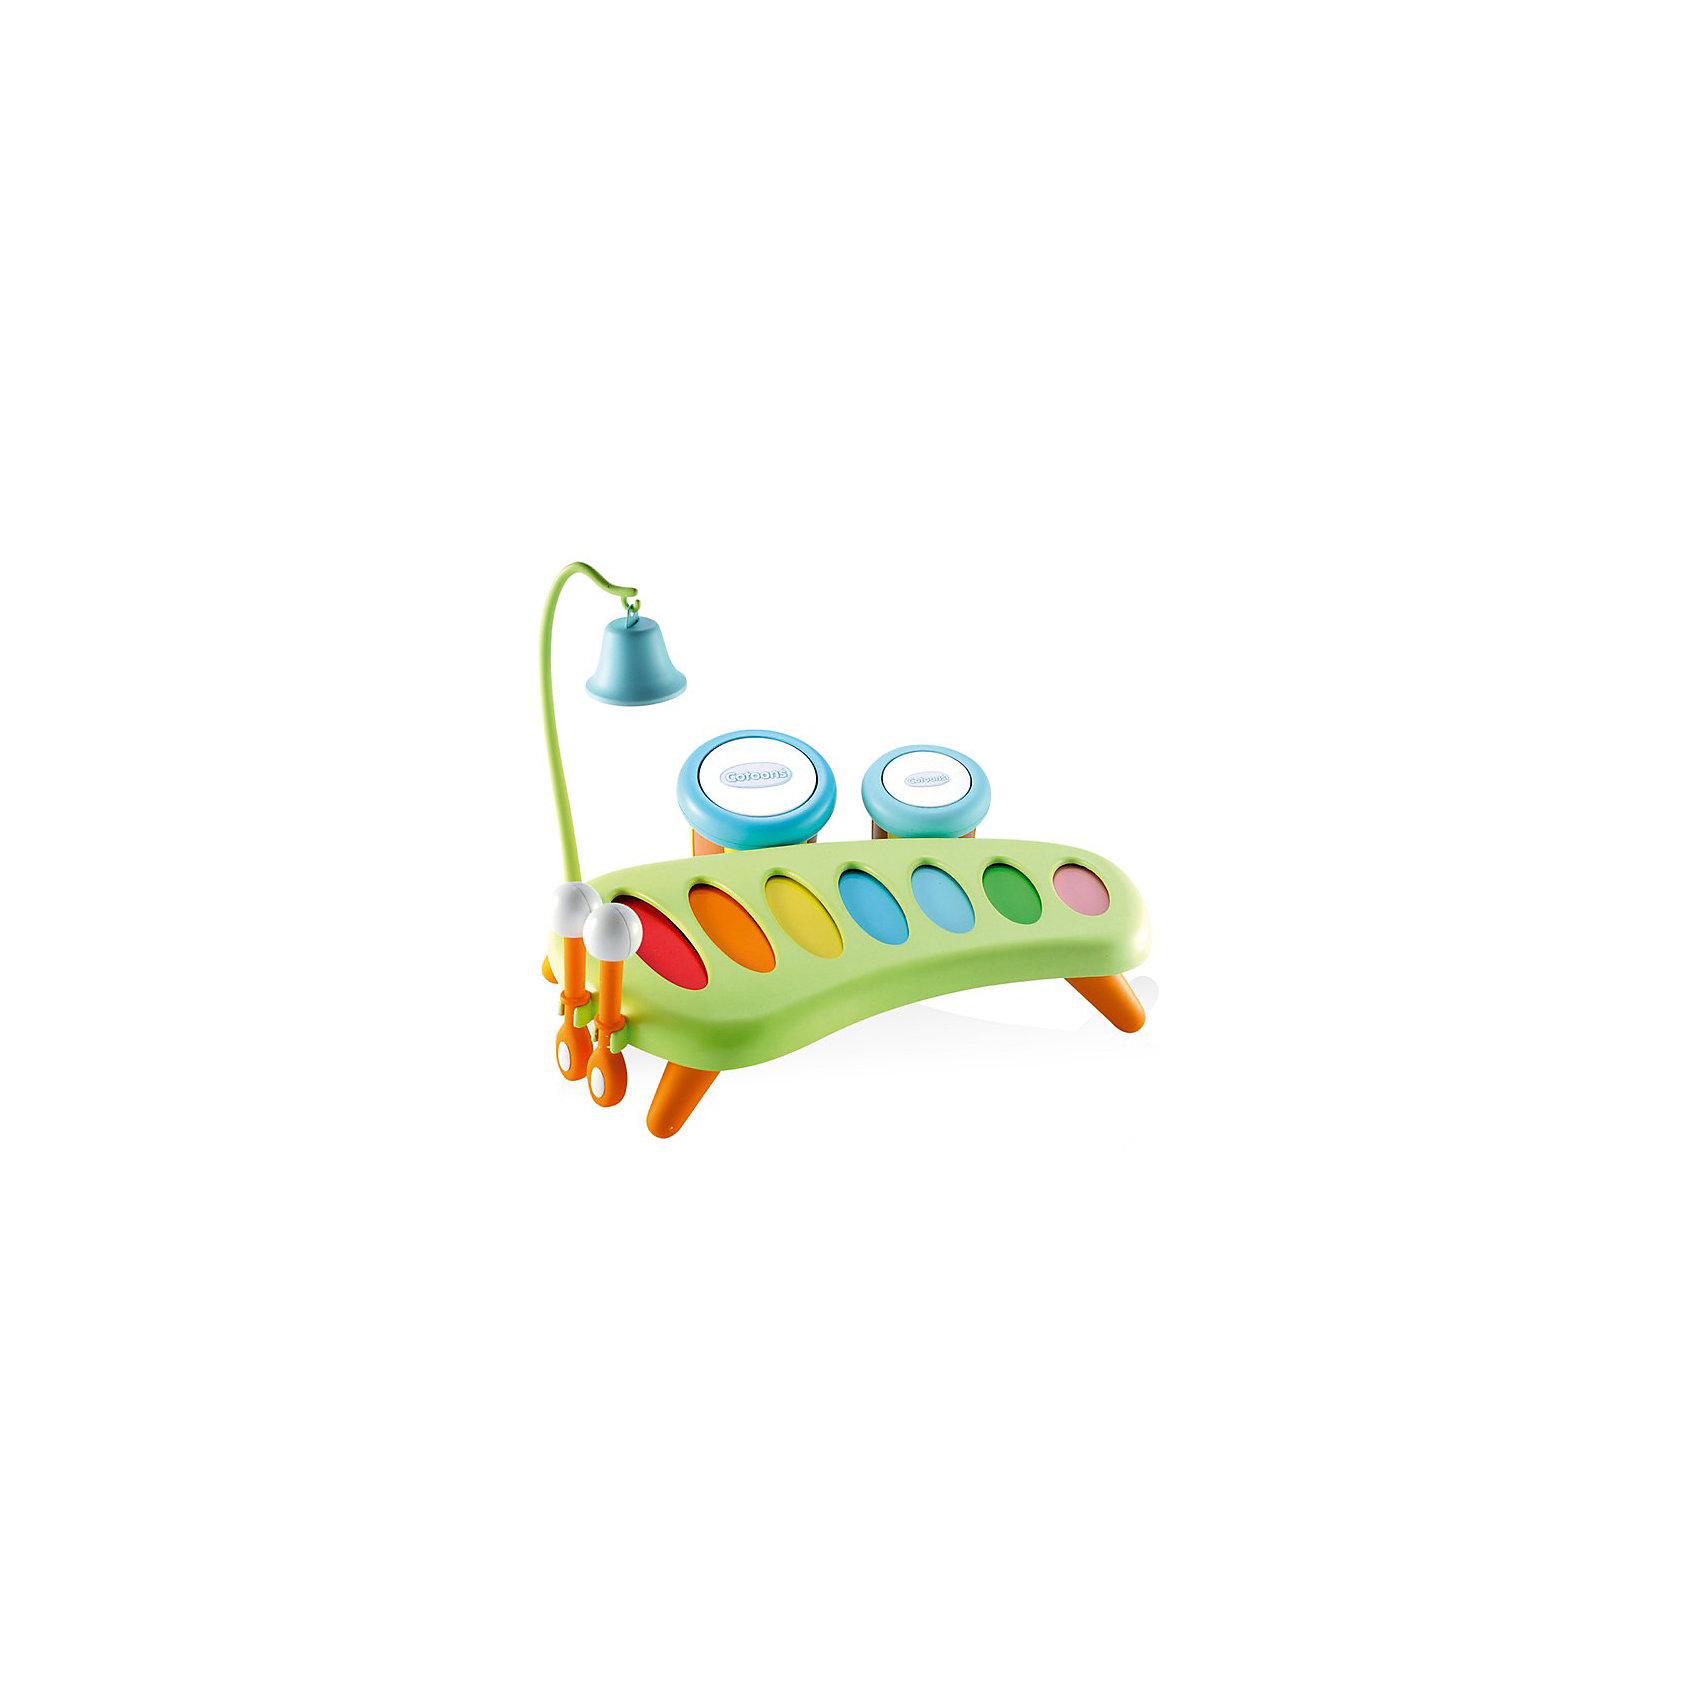 Smoby Smoby Cotoons Музыкальный инструмент - ксилофон погремушка калейдоскоп smoby cotoons